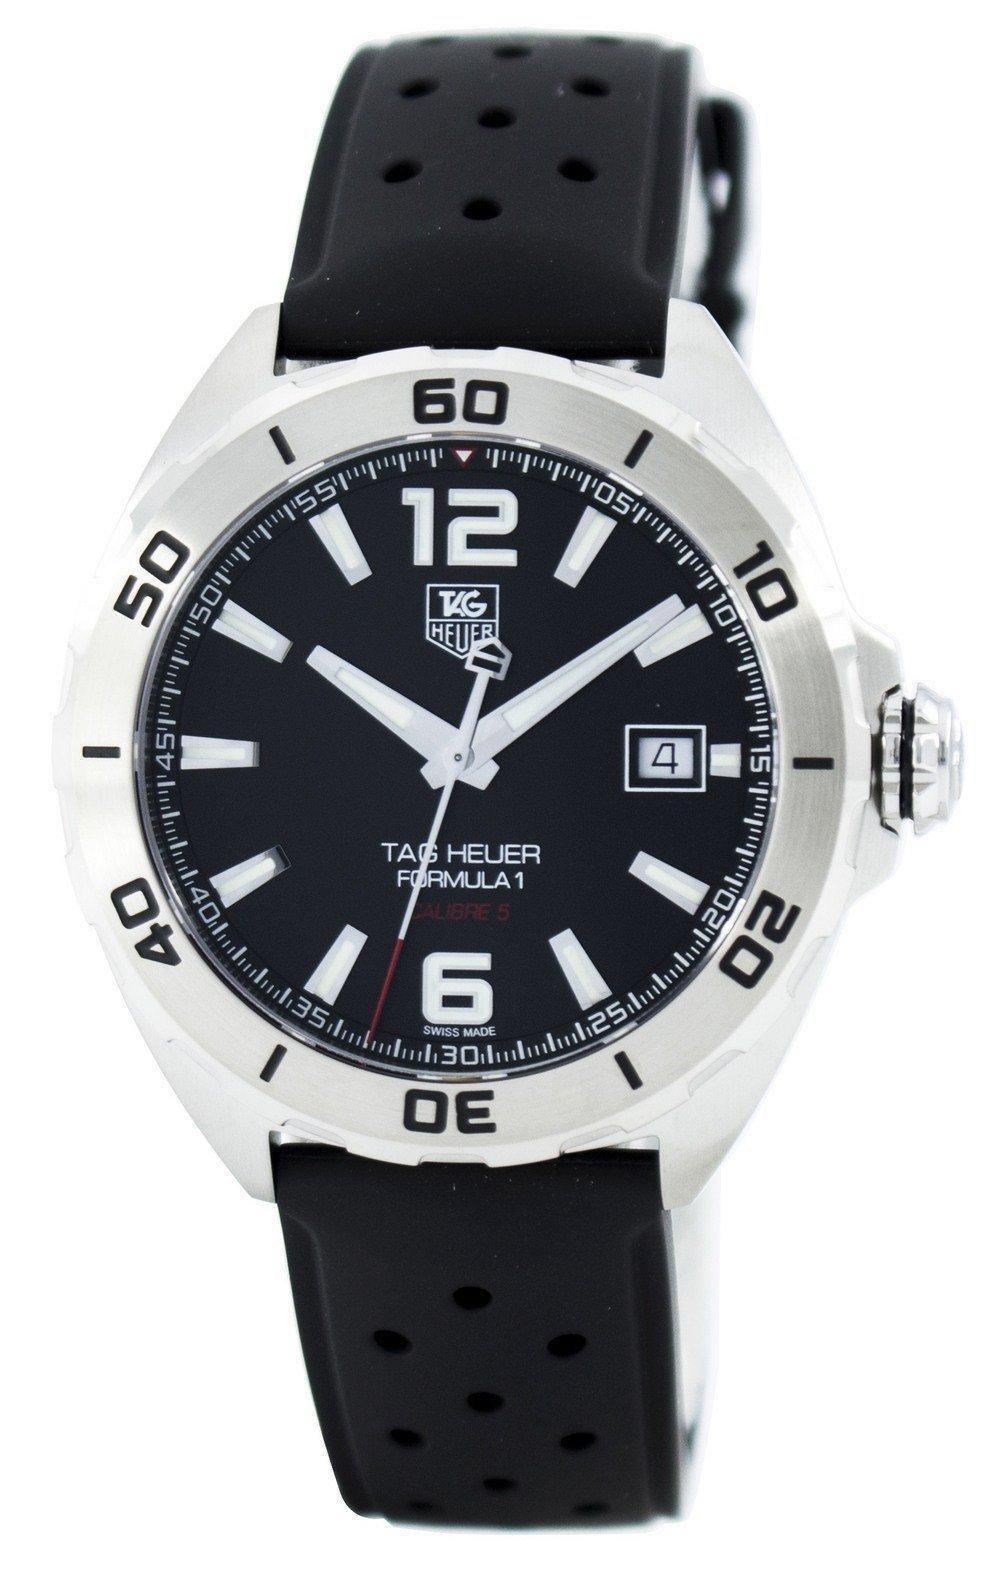 Tag Heuer Formula 1 Automatic Calibre 5 Swiss Made 200m Waz2113.ft8023 Men's Watch (FREE Shipping)